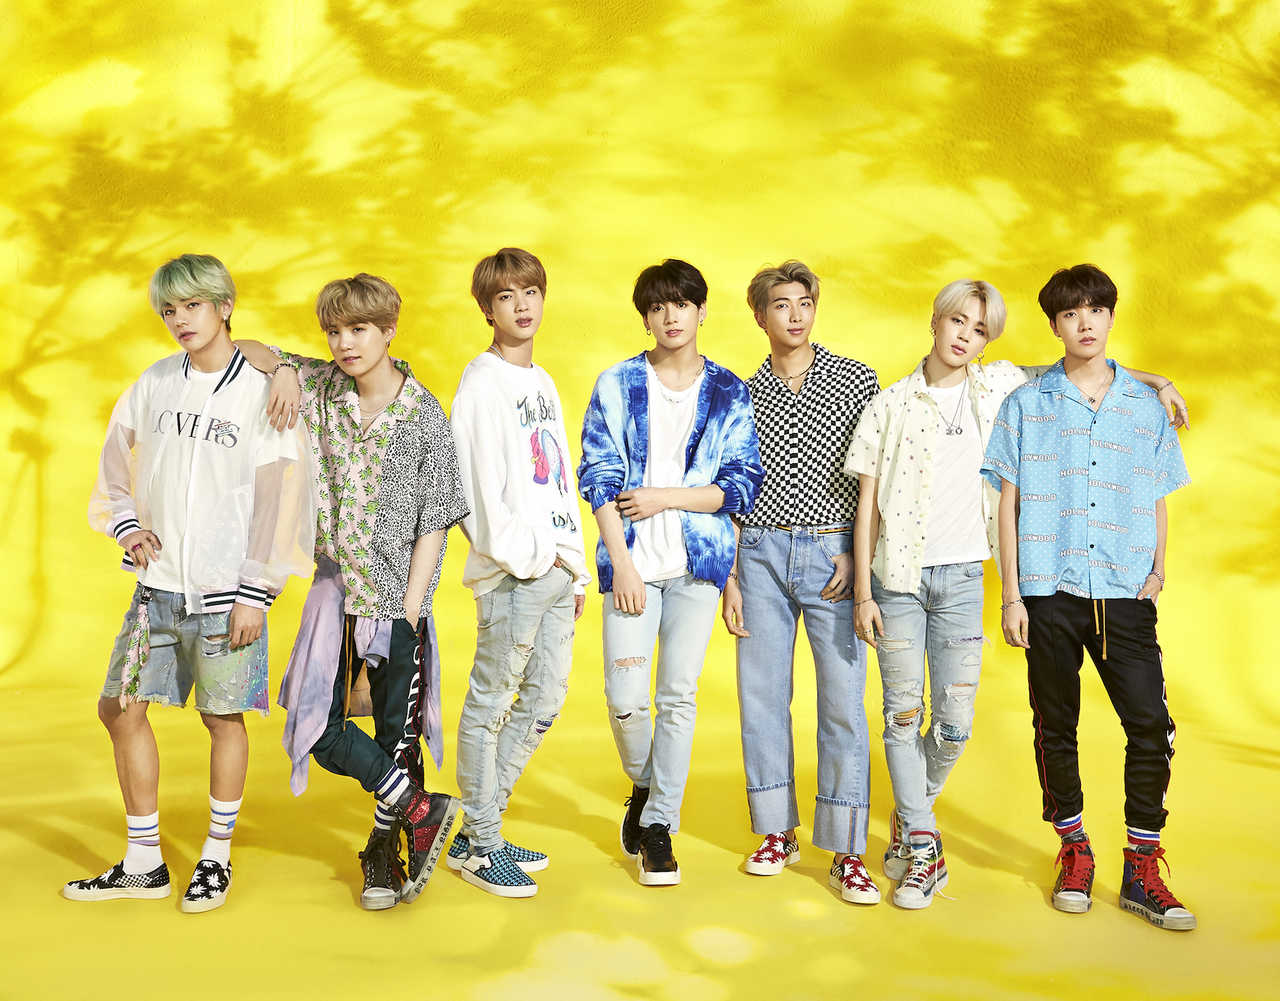 BTS ワールドツアー欧米で65万人動員!次は日本へ。シングル予約数も50万枚突破!